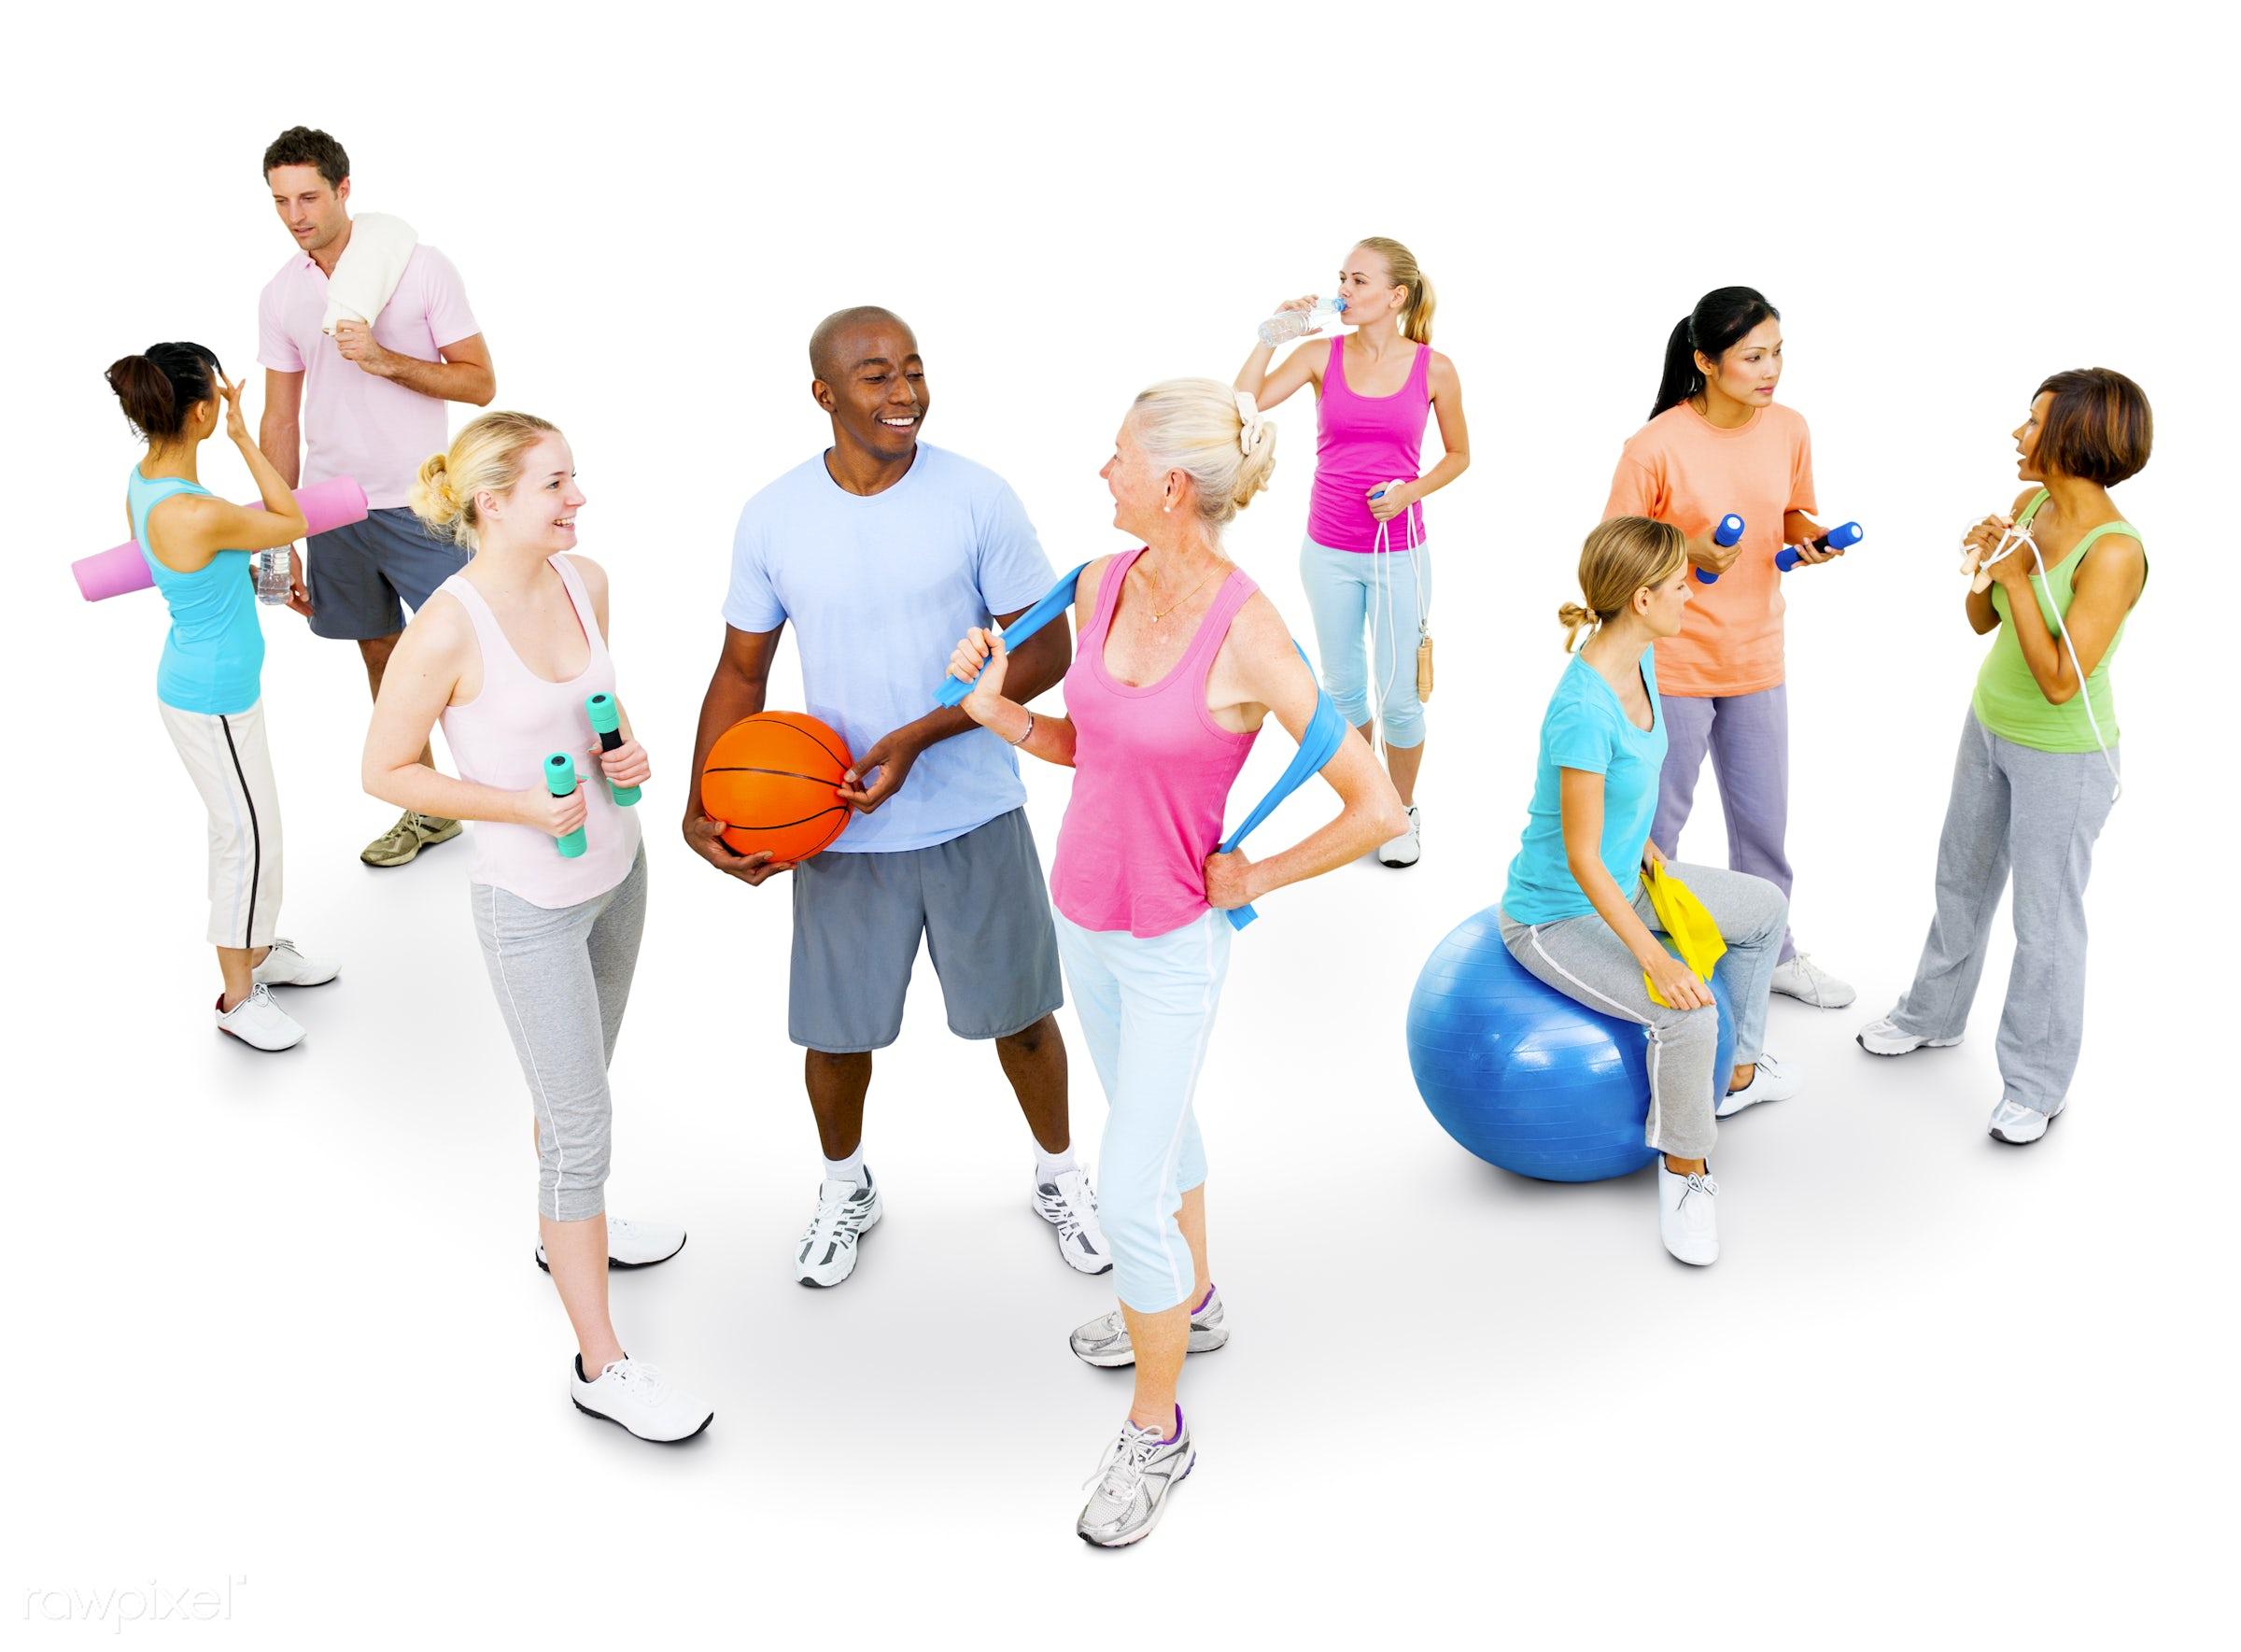 caucasian, active, activity, adult, aerobics, athlete, athletic, ball, cheerful, dumbbell, enjoyment, equipment, exercise,...